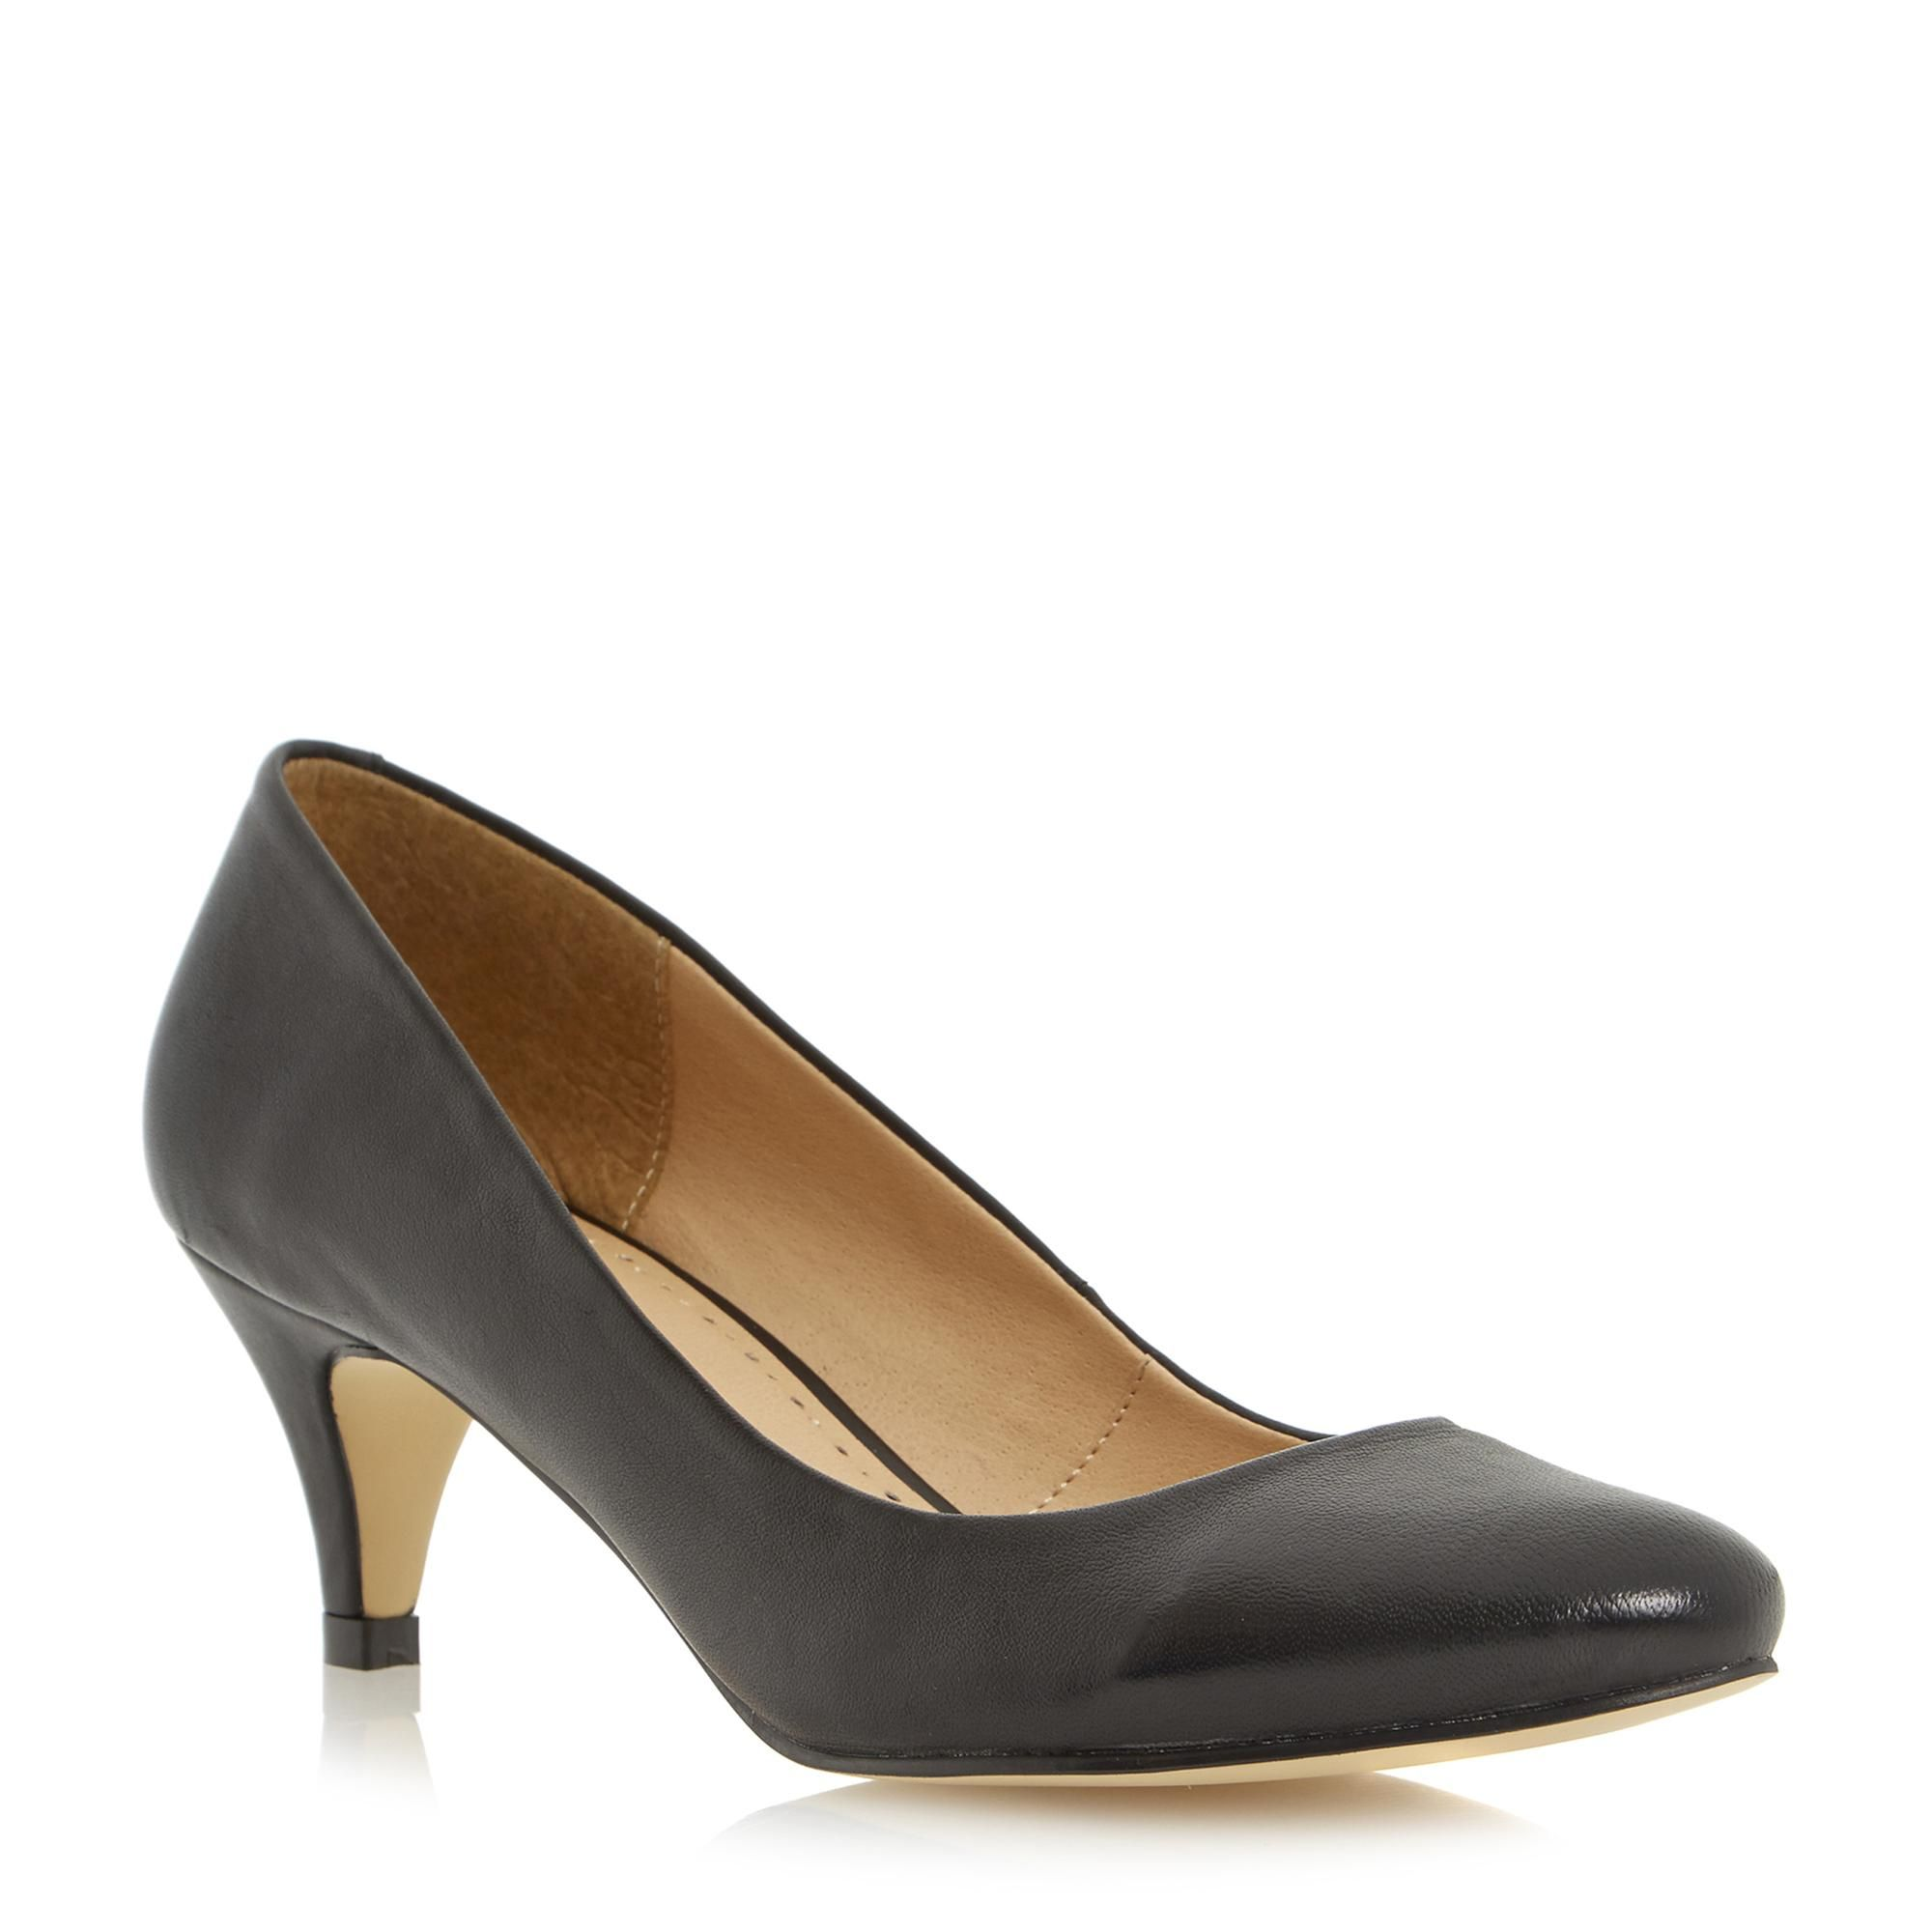 Low Heel Leather Round Toe Court Shoe